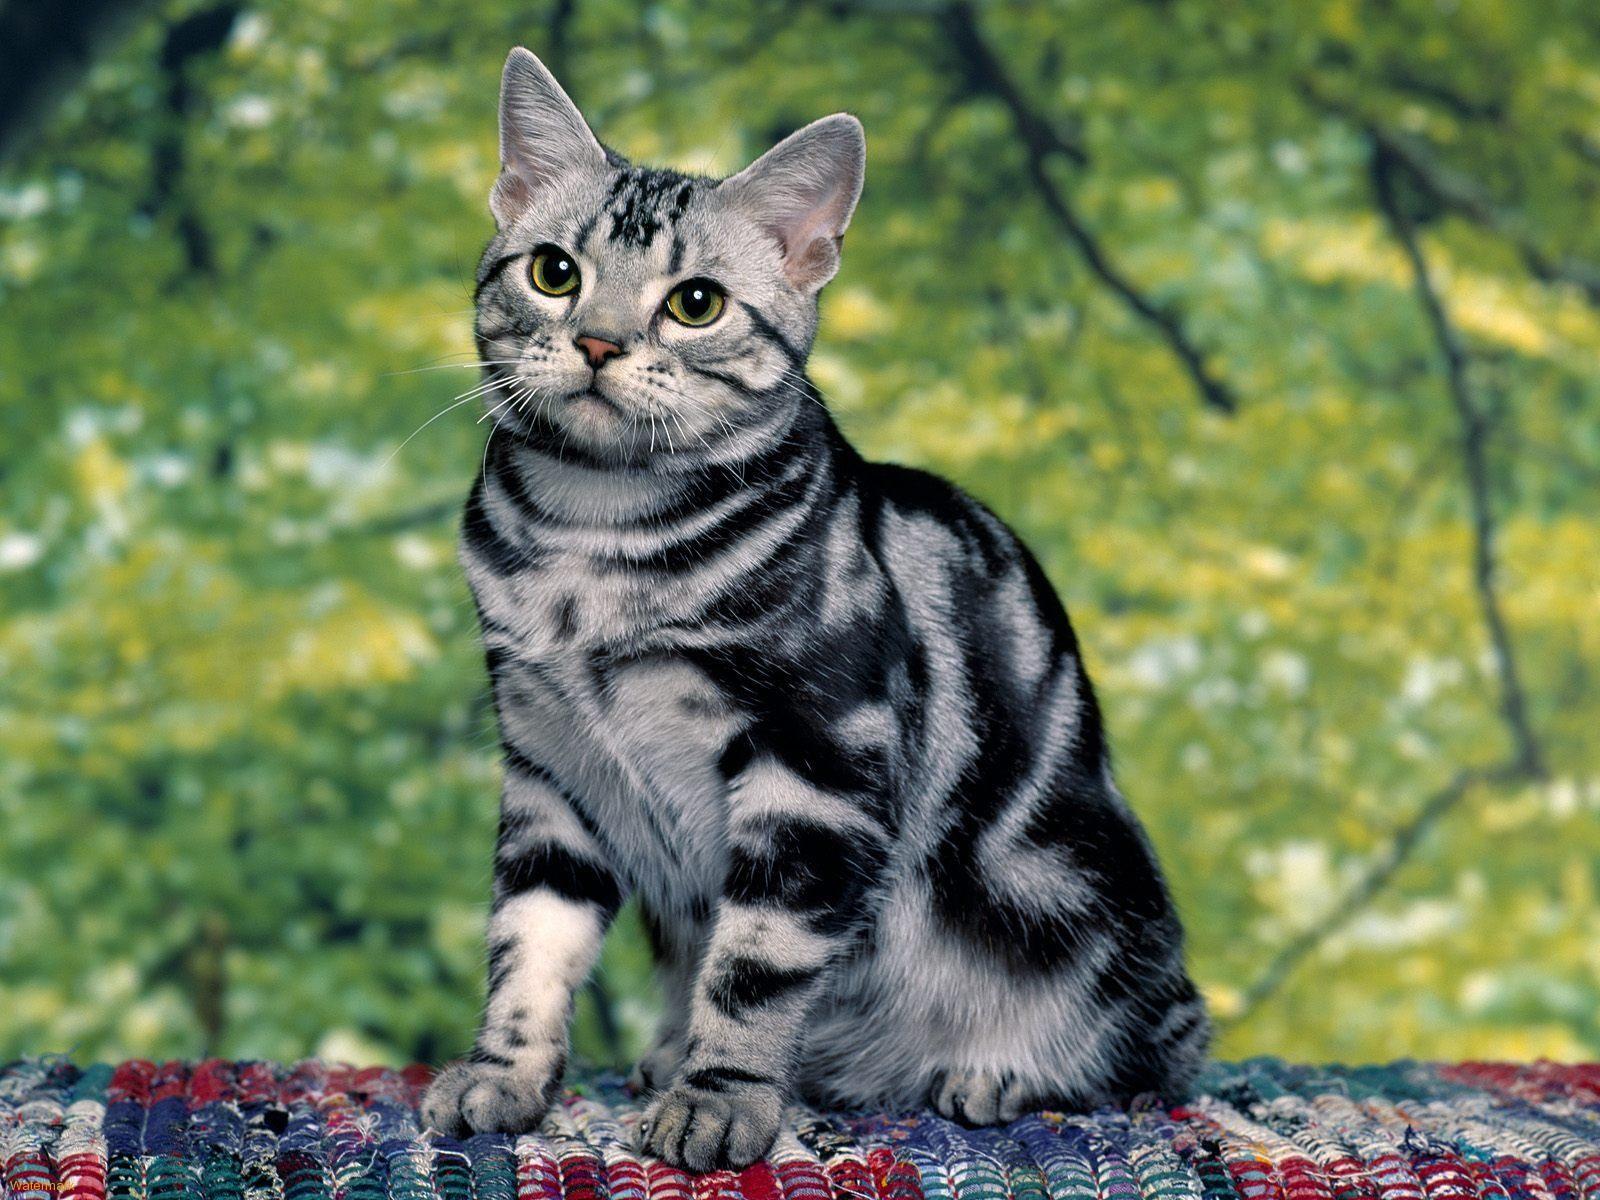 Silver Tabby Wallpaper Free Earth Wallpaper For Desktop American Shorthair Cat Popular Cat Breeds Cat Breeds